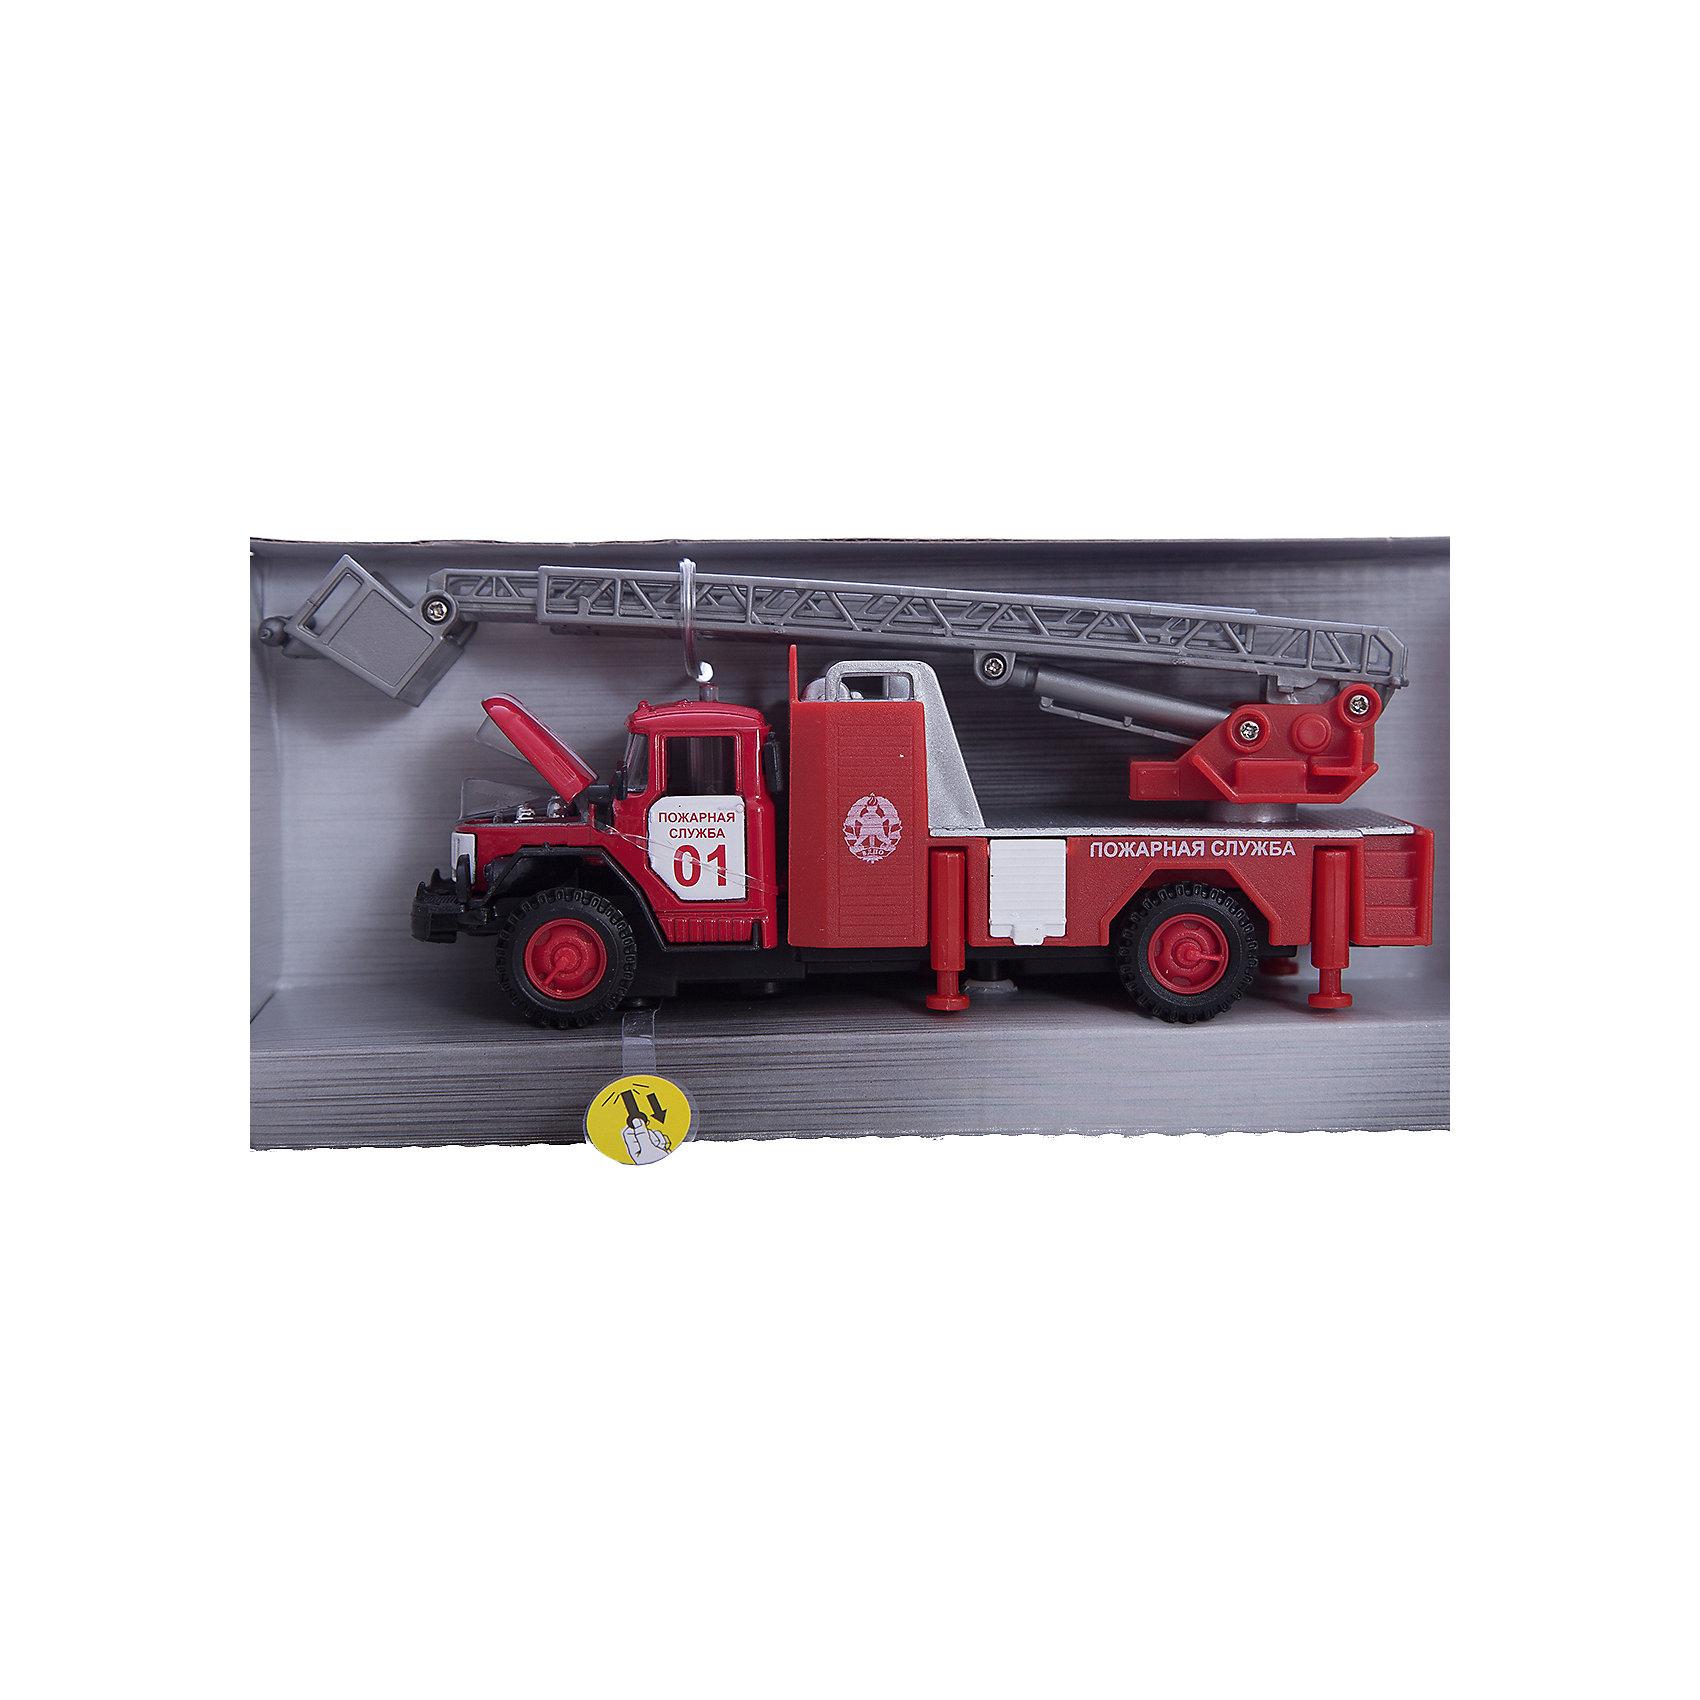 Машина ЗИЛ 131 Пожарная служба, свет+звук, ТЕХНОПАРКМашина Технопарк металлическая  инерционная ЗИЛ 131 Пожарная служба, свет+звук.<br><br>Ширина мм: 60<br>Глубина мм: 150<br>Высота мм: 220<br>Вес г: 220<br>Возраст от месяцев: 36<br>Возраст до месяцев: 84<br>Пол: Мужской<br>Возраст: Детский<br>SKU: 5420369